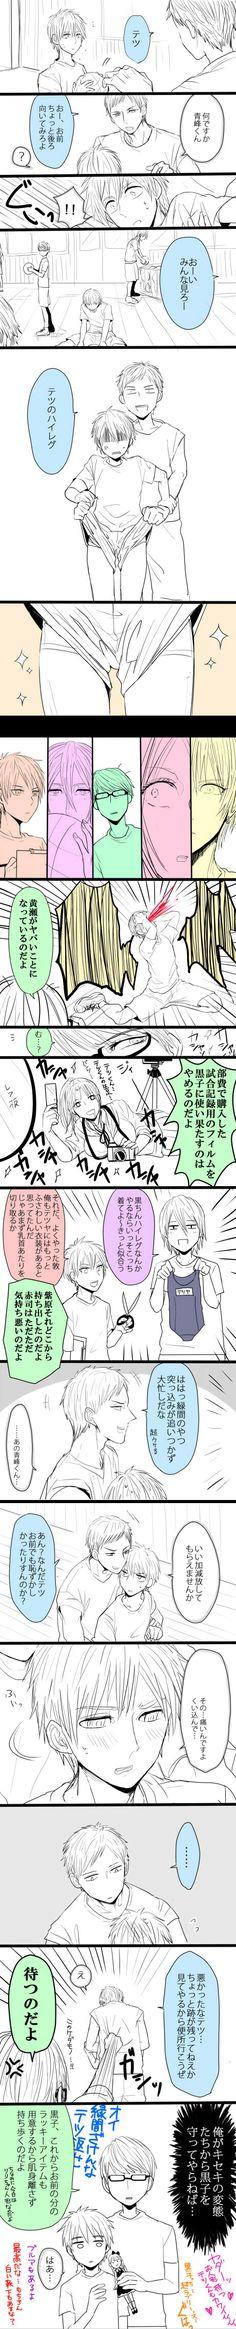 Hahaha,Gives him A doll. Poor kuroko